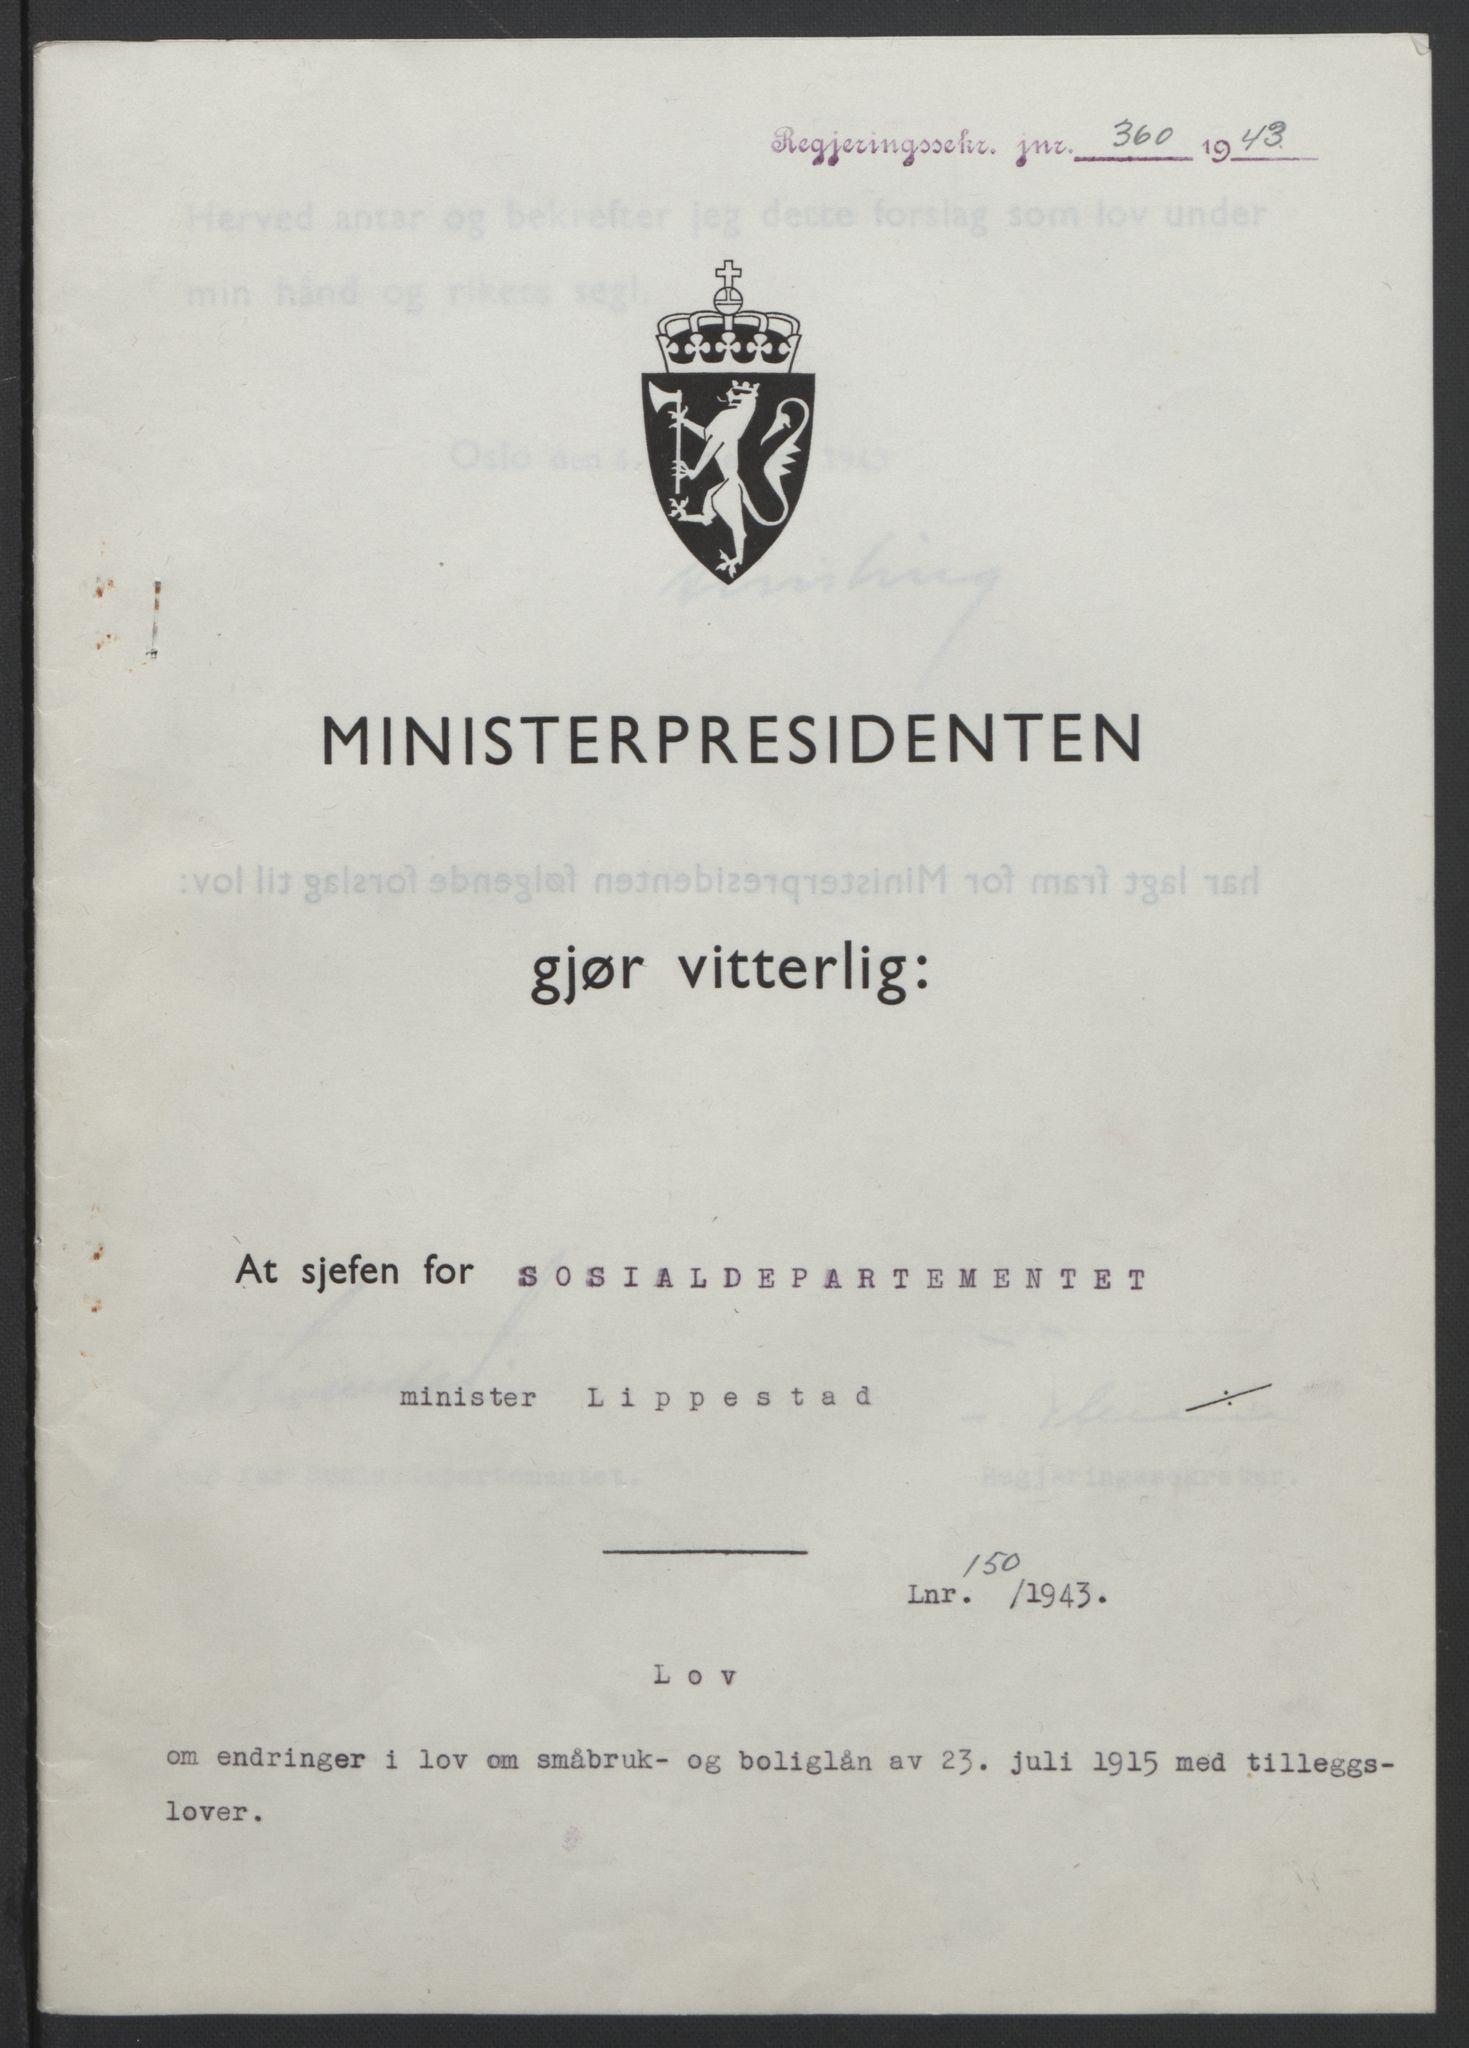 RA, NS-administrasjonen 1940-1945 (Statsrådsekretariatet, de kommisariske statsråder mm), D/Db/L0099: Lover, 1943, s. 701